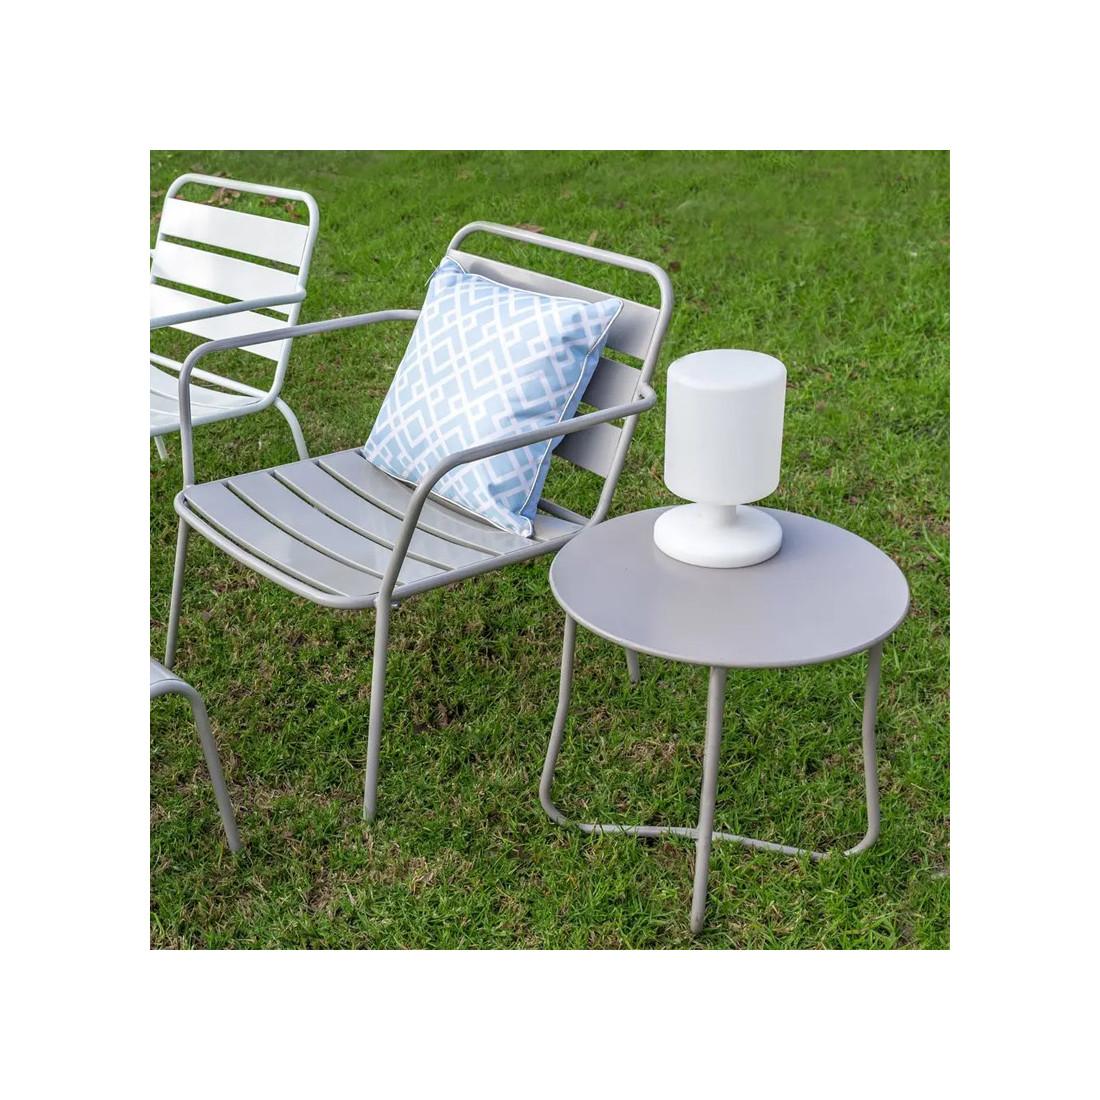 lampe de table r sine blanche n 3 caucase univers du jardin. Black Bedroom Furniture Sets. Home Design Ideas